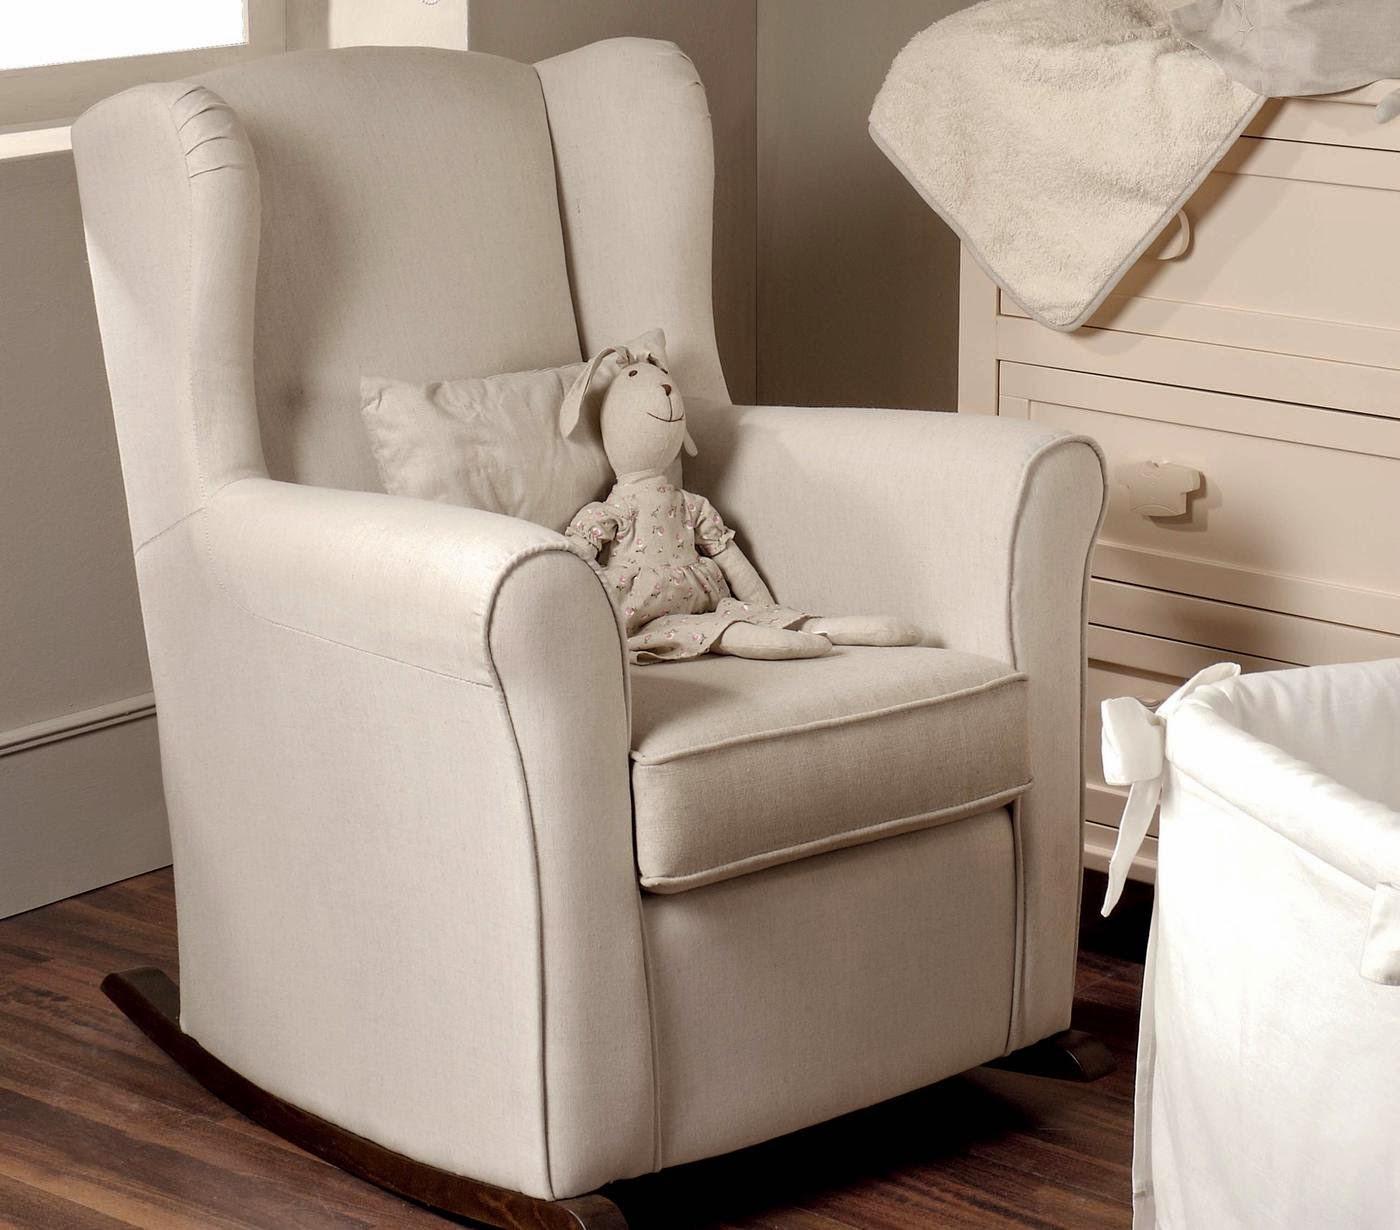 Tu tienda ahorro mecedora de lactancia for Muebles baratos murcia